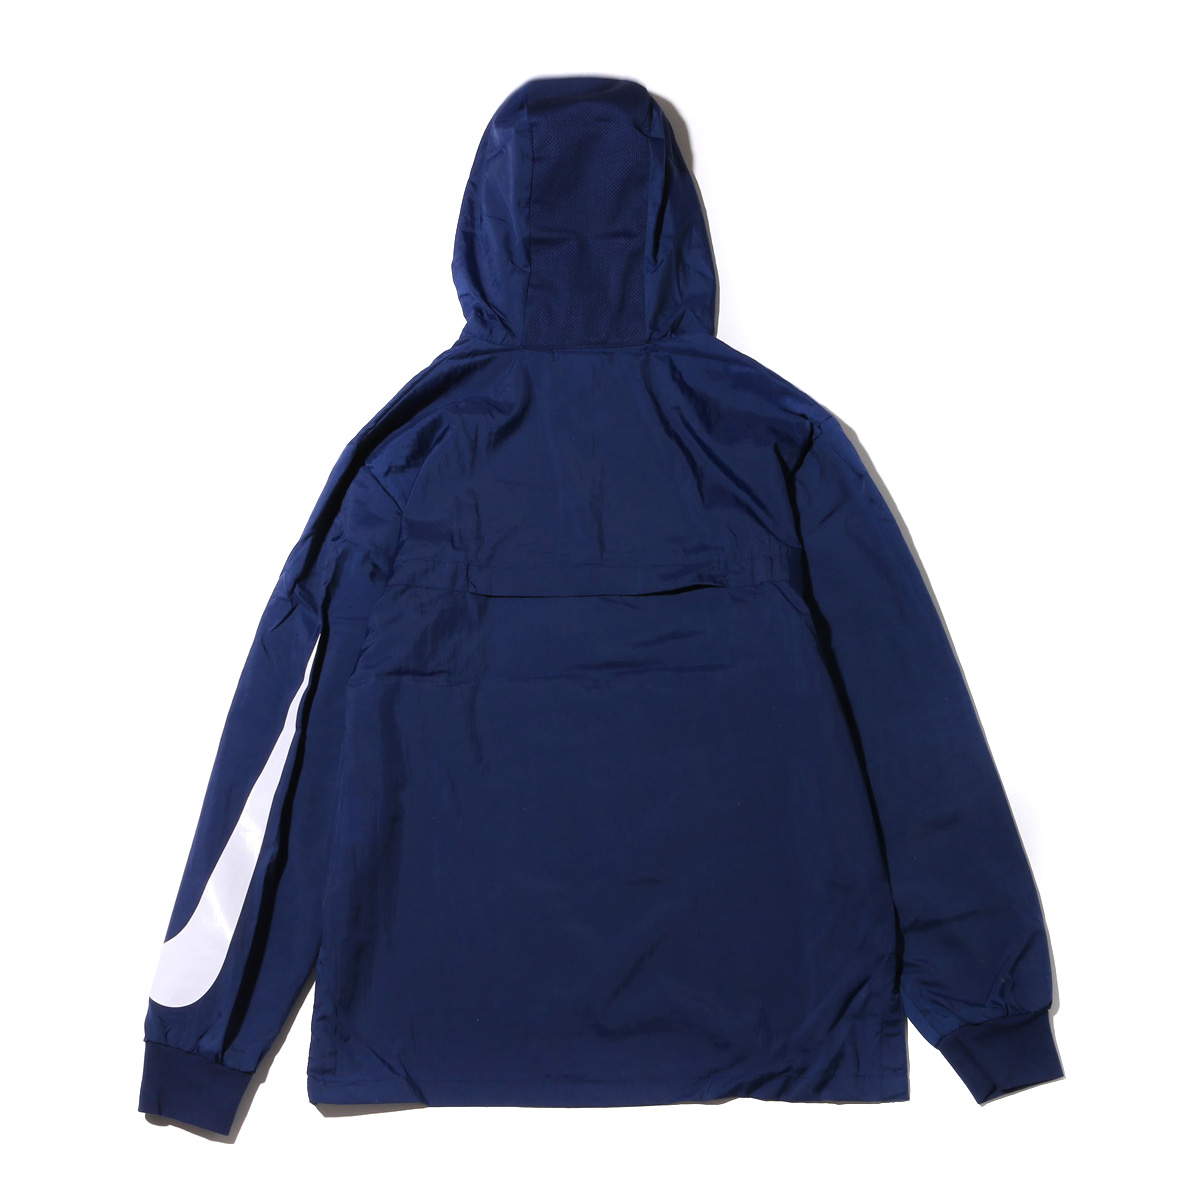 NIKE AS M NSW JKT HD WVN PKBL (나이키워분팍카브르후디쟈켓트) (BINARY BLUE/WHITE) 17 SU-I